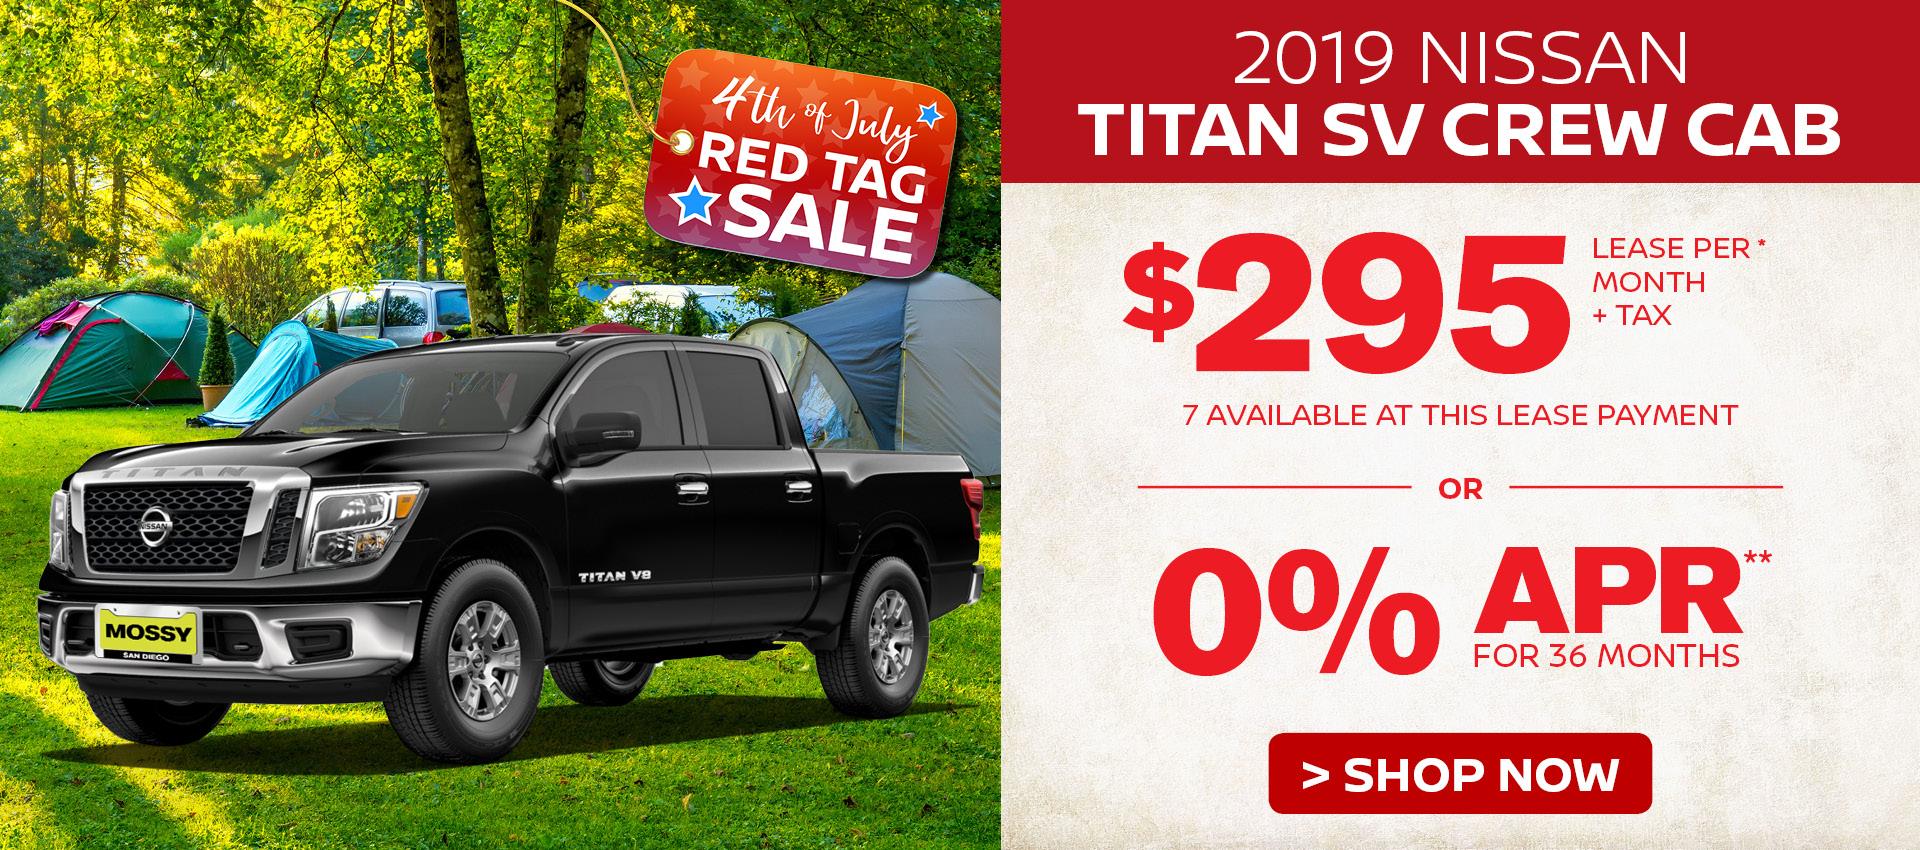 Mossy Nissan - Nissan Titan $295 Lease HP